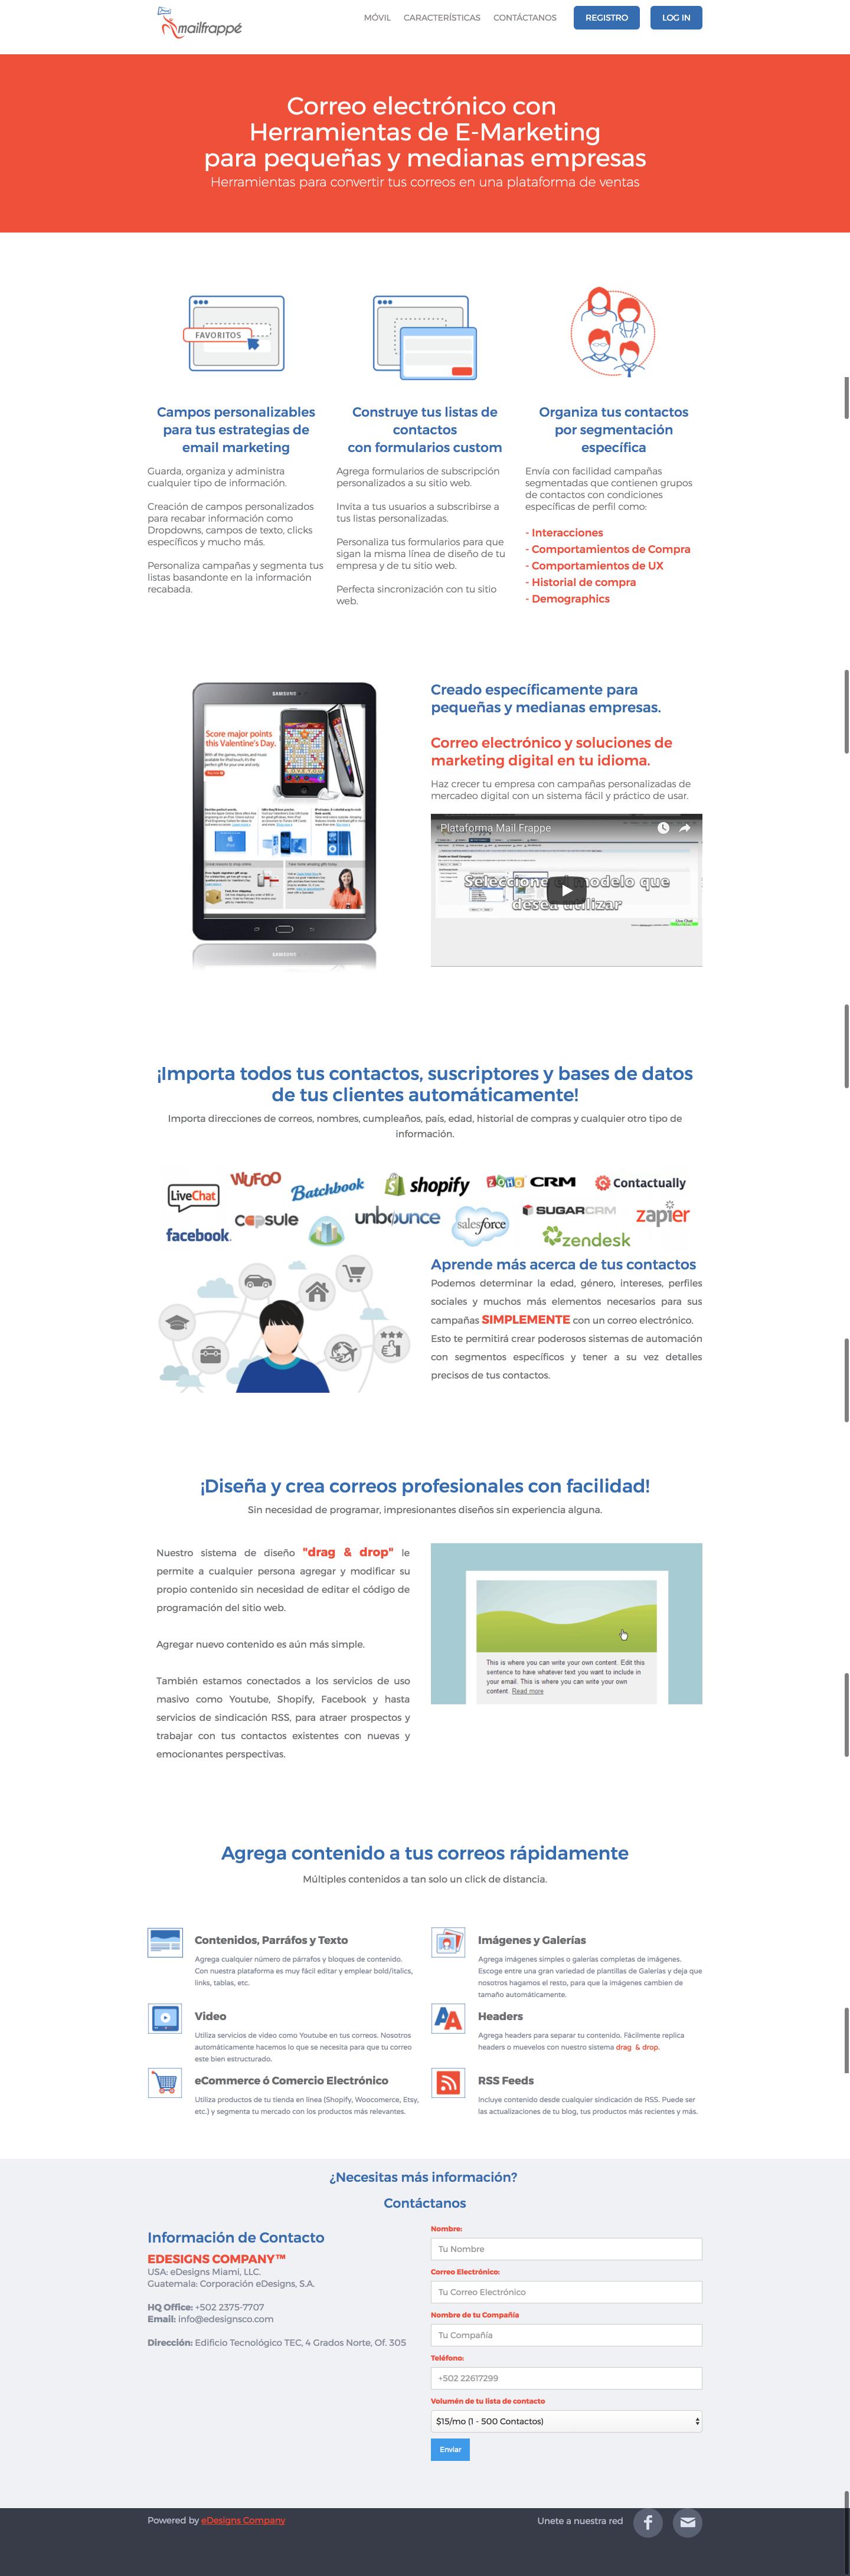 www.Mailfrappe.com